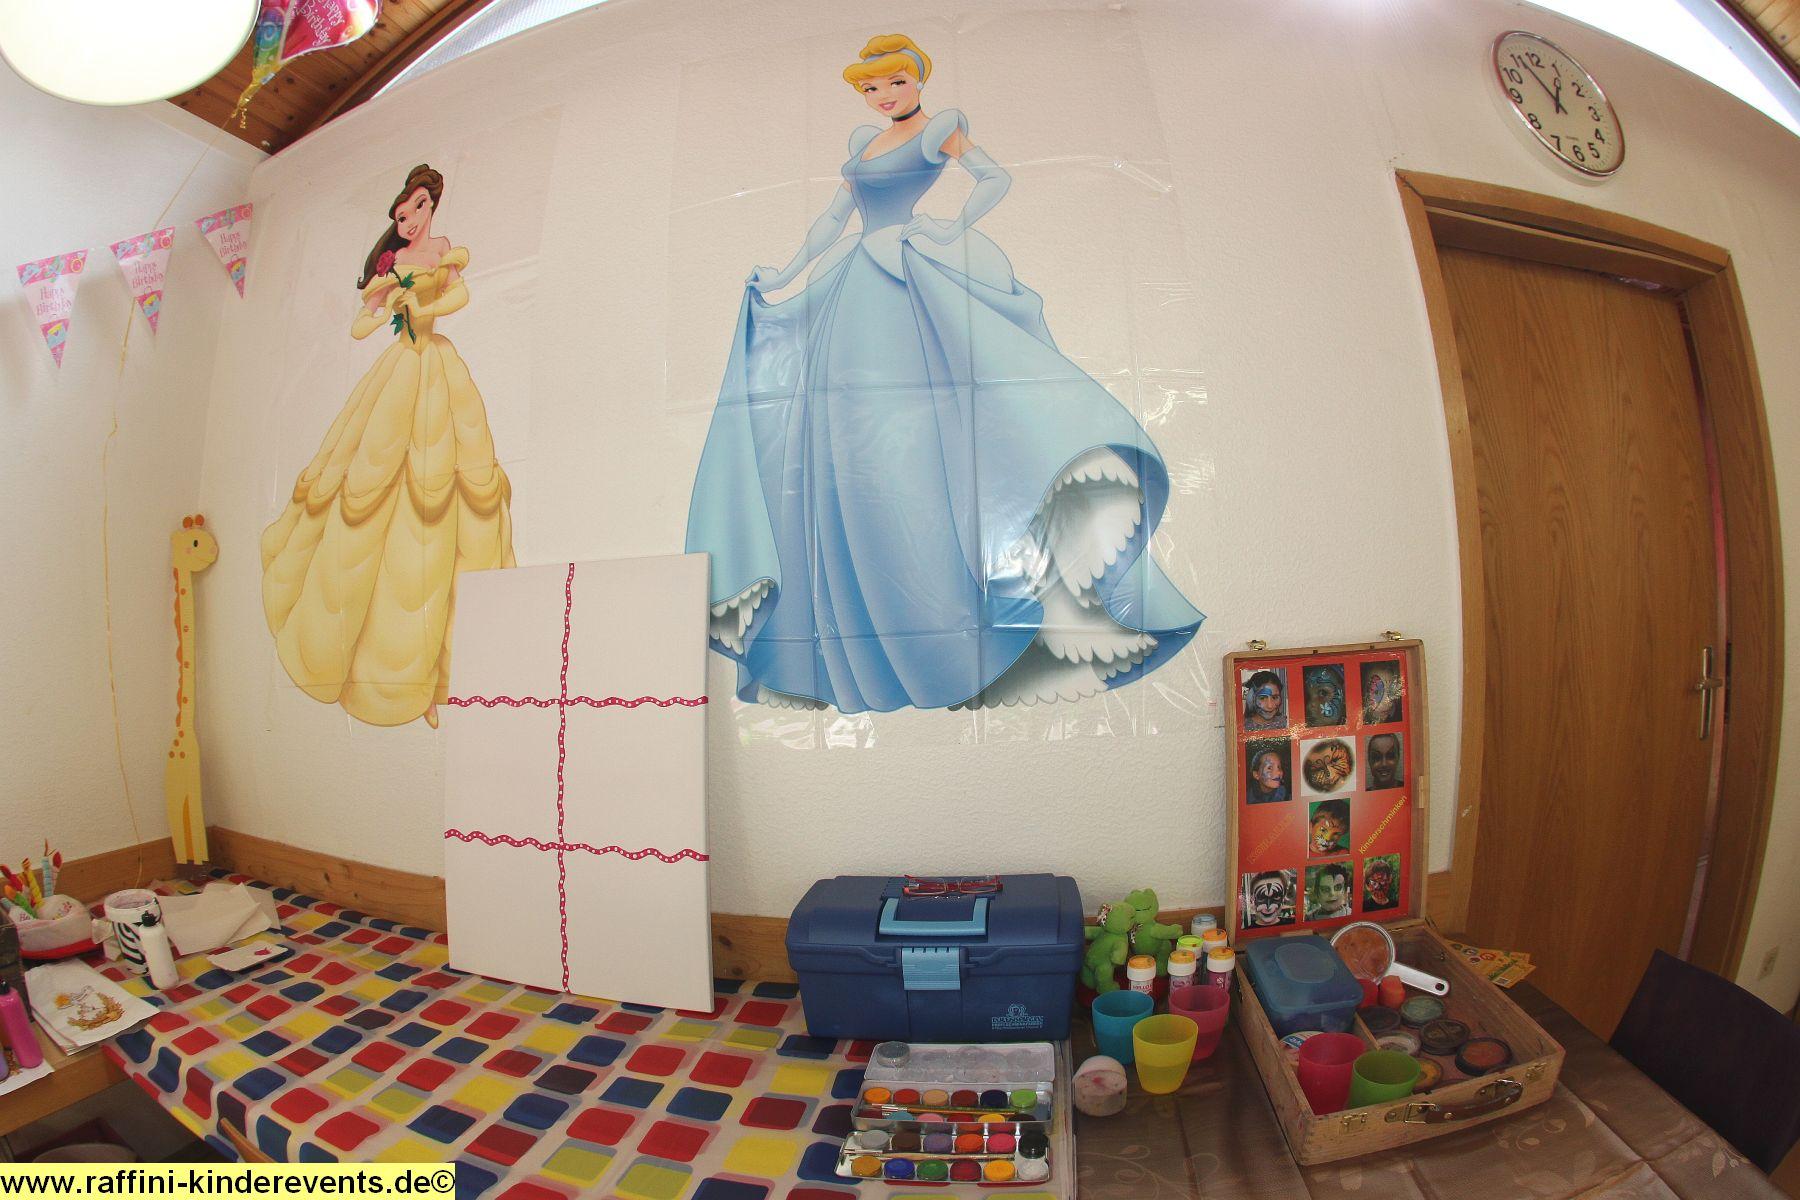 dekoration kinderparty hochzeit kindergeburtstag raffini kinderevents kindereventagentur. Black Bedroom Furniture Sets. Home Design Ideas